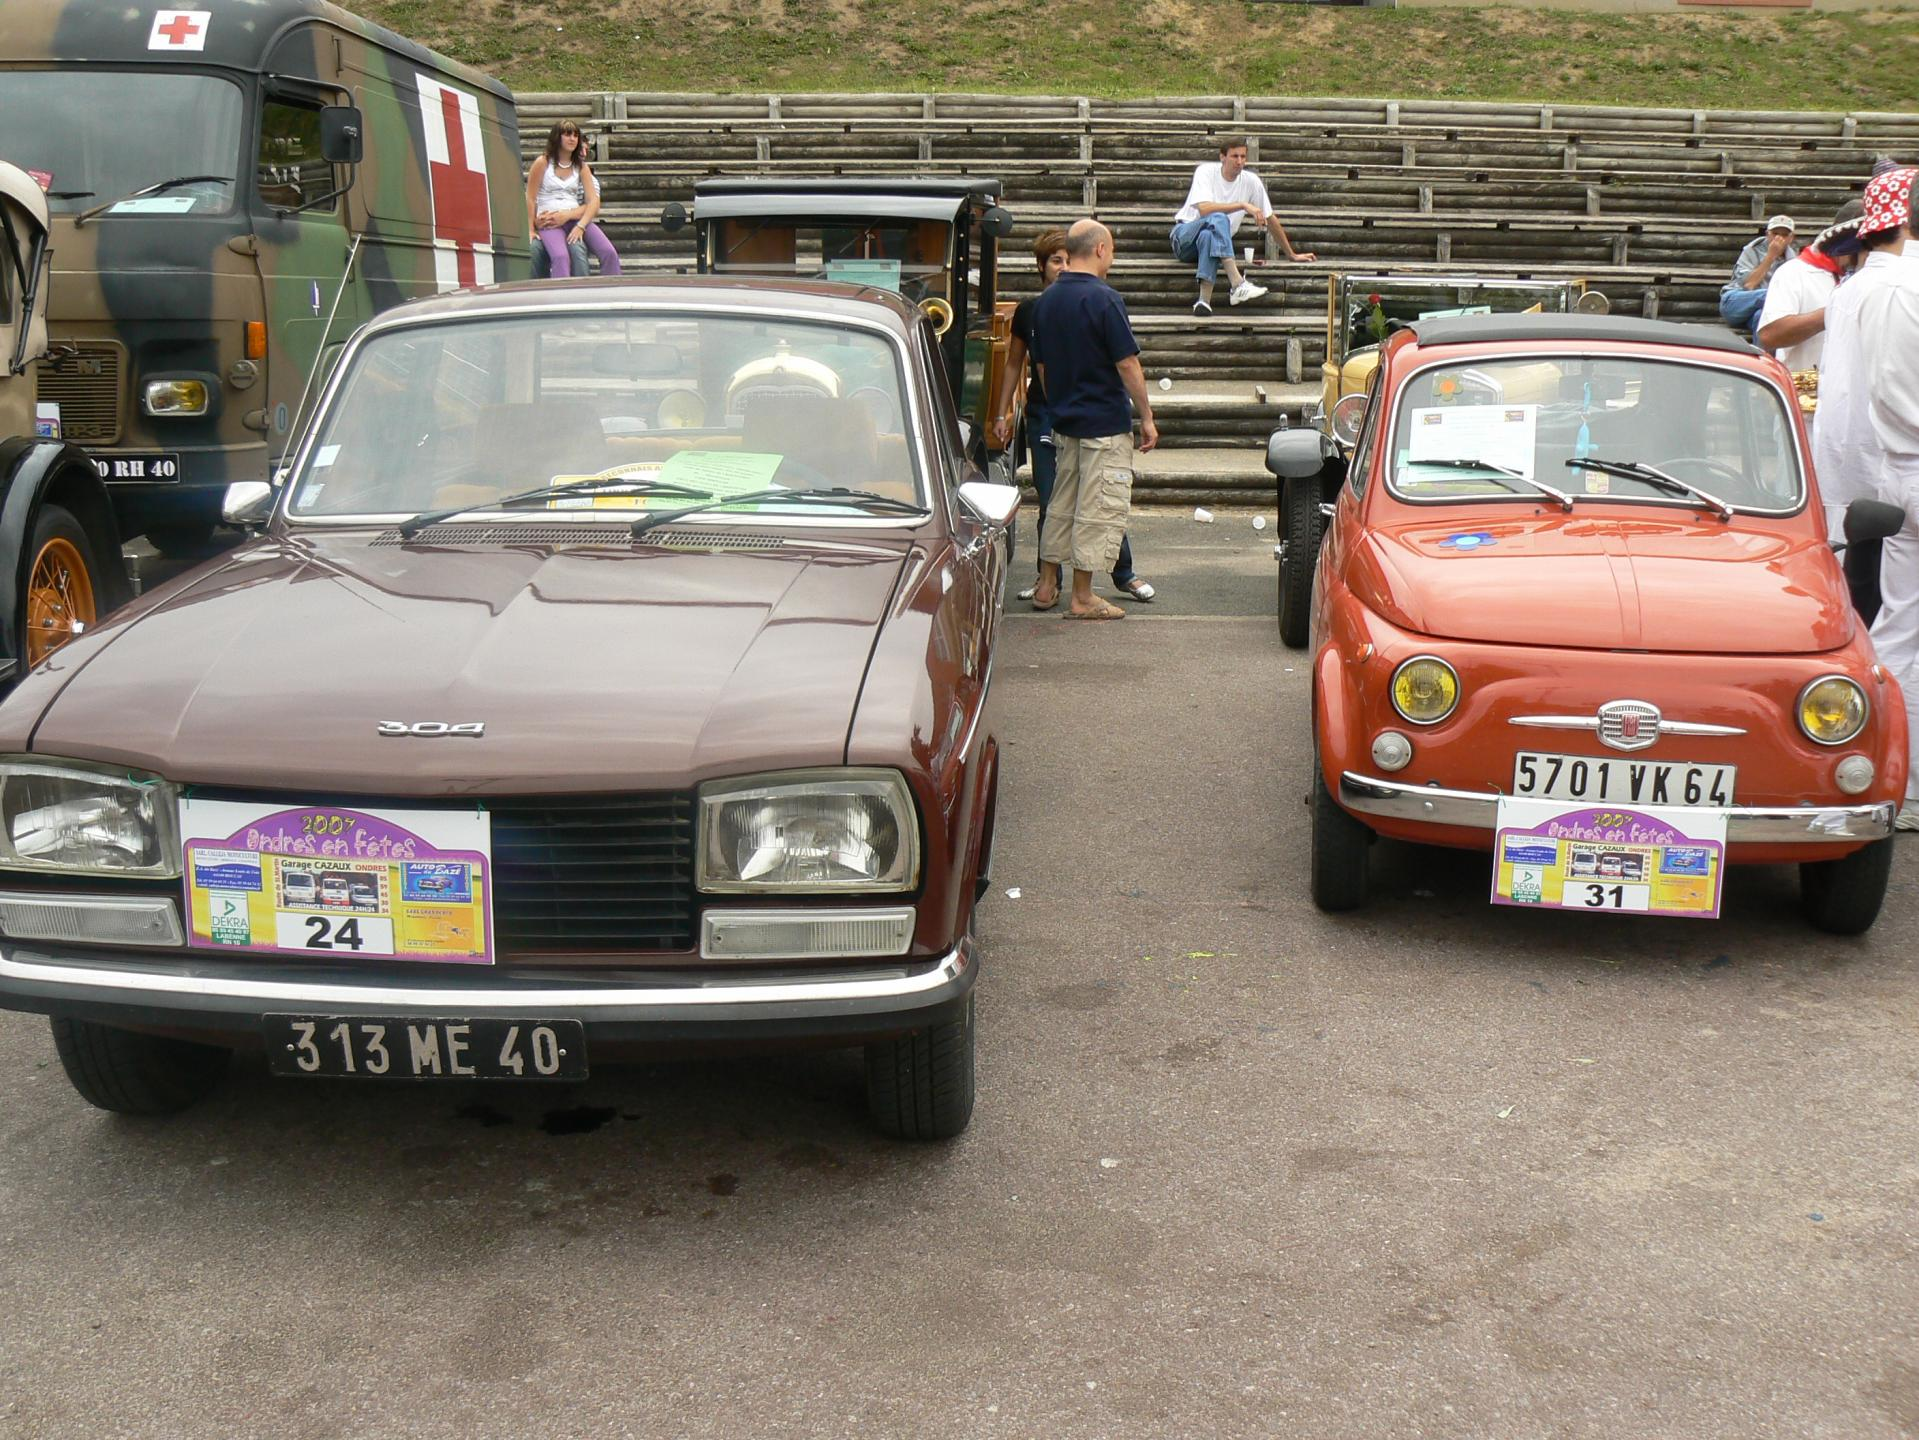 Peugeot 304 & fiat 500